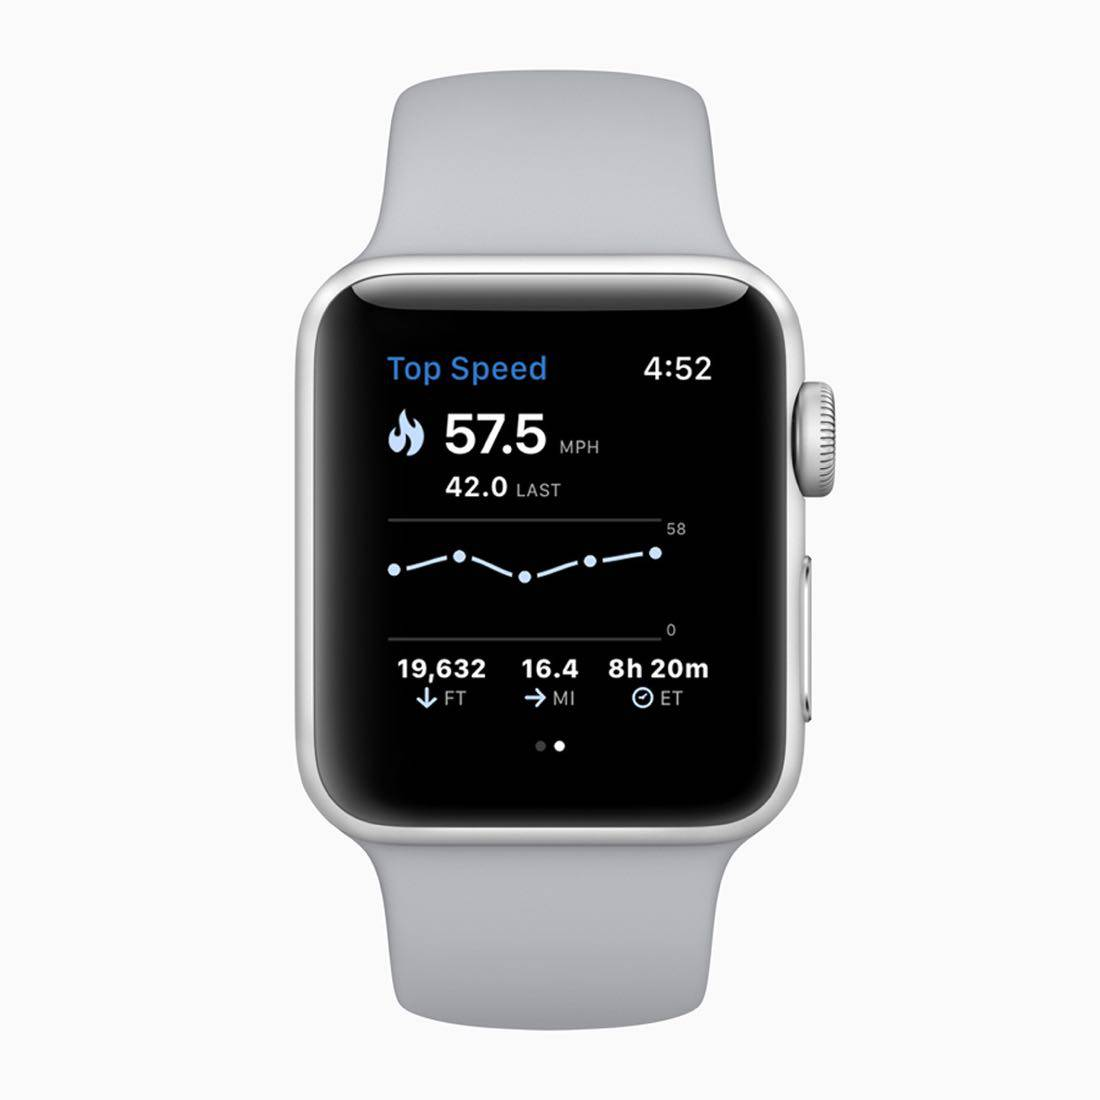 Apple Watch Series 3 top speed 20282018